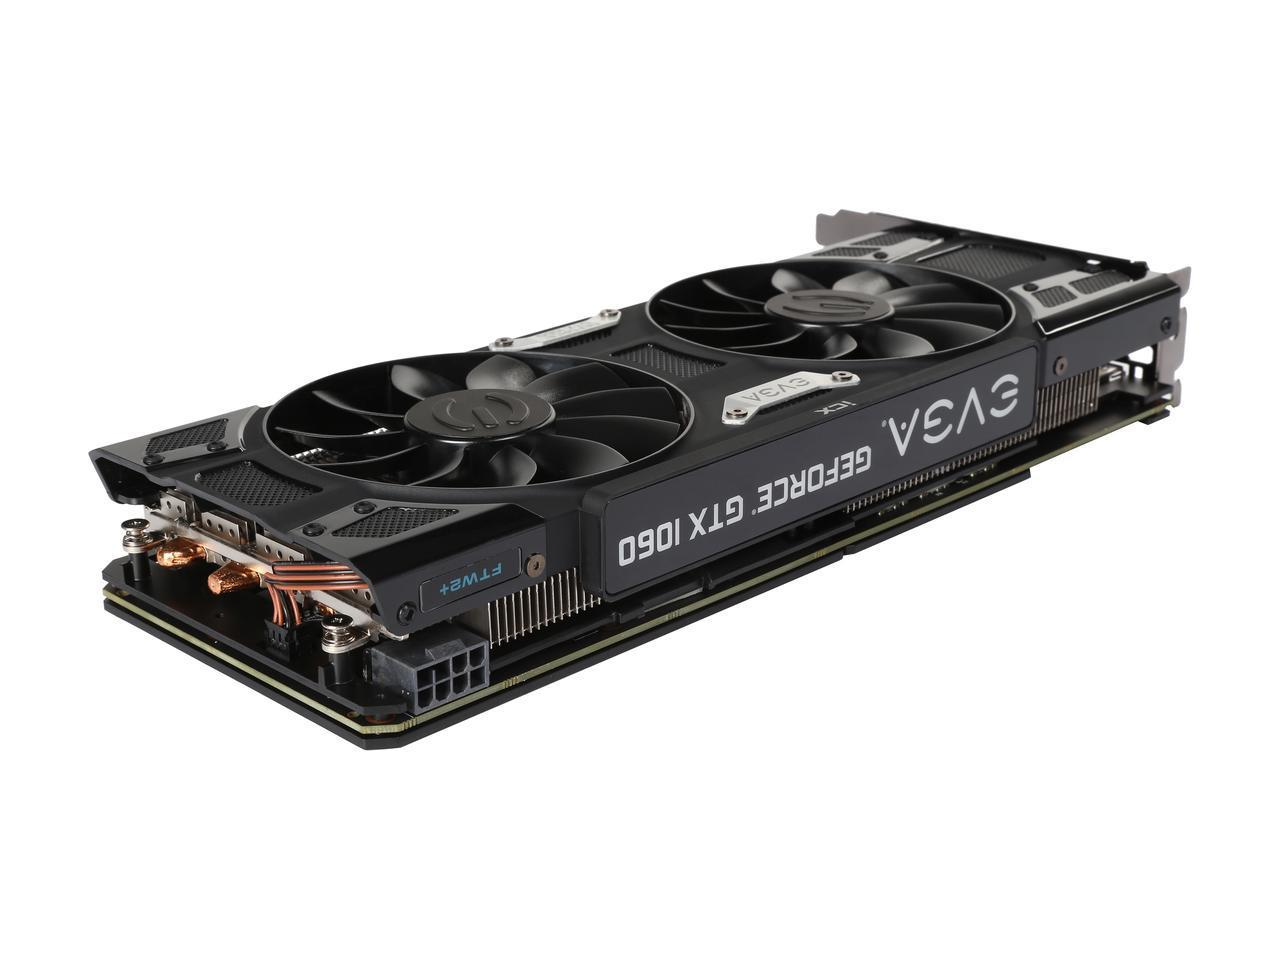 VGA EVGA Geforce GTX 1060 FTW2 Gaming 6GB (06G-P4-6768-KR)